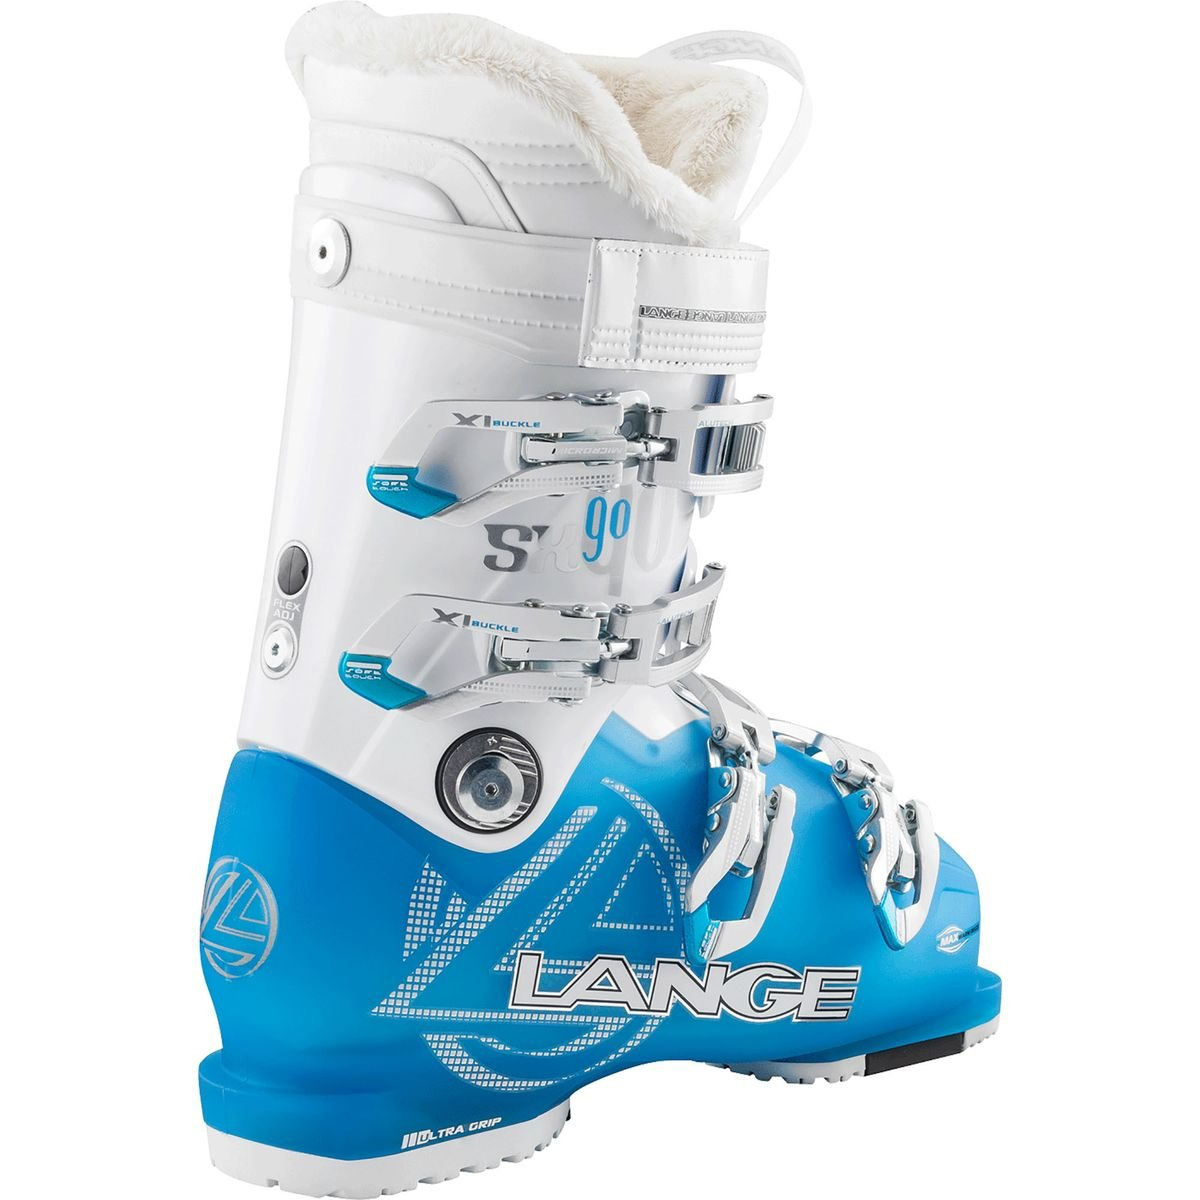 899d98186e 90 W color azul Sx color azul para mujer Lange-Botas De esquí